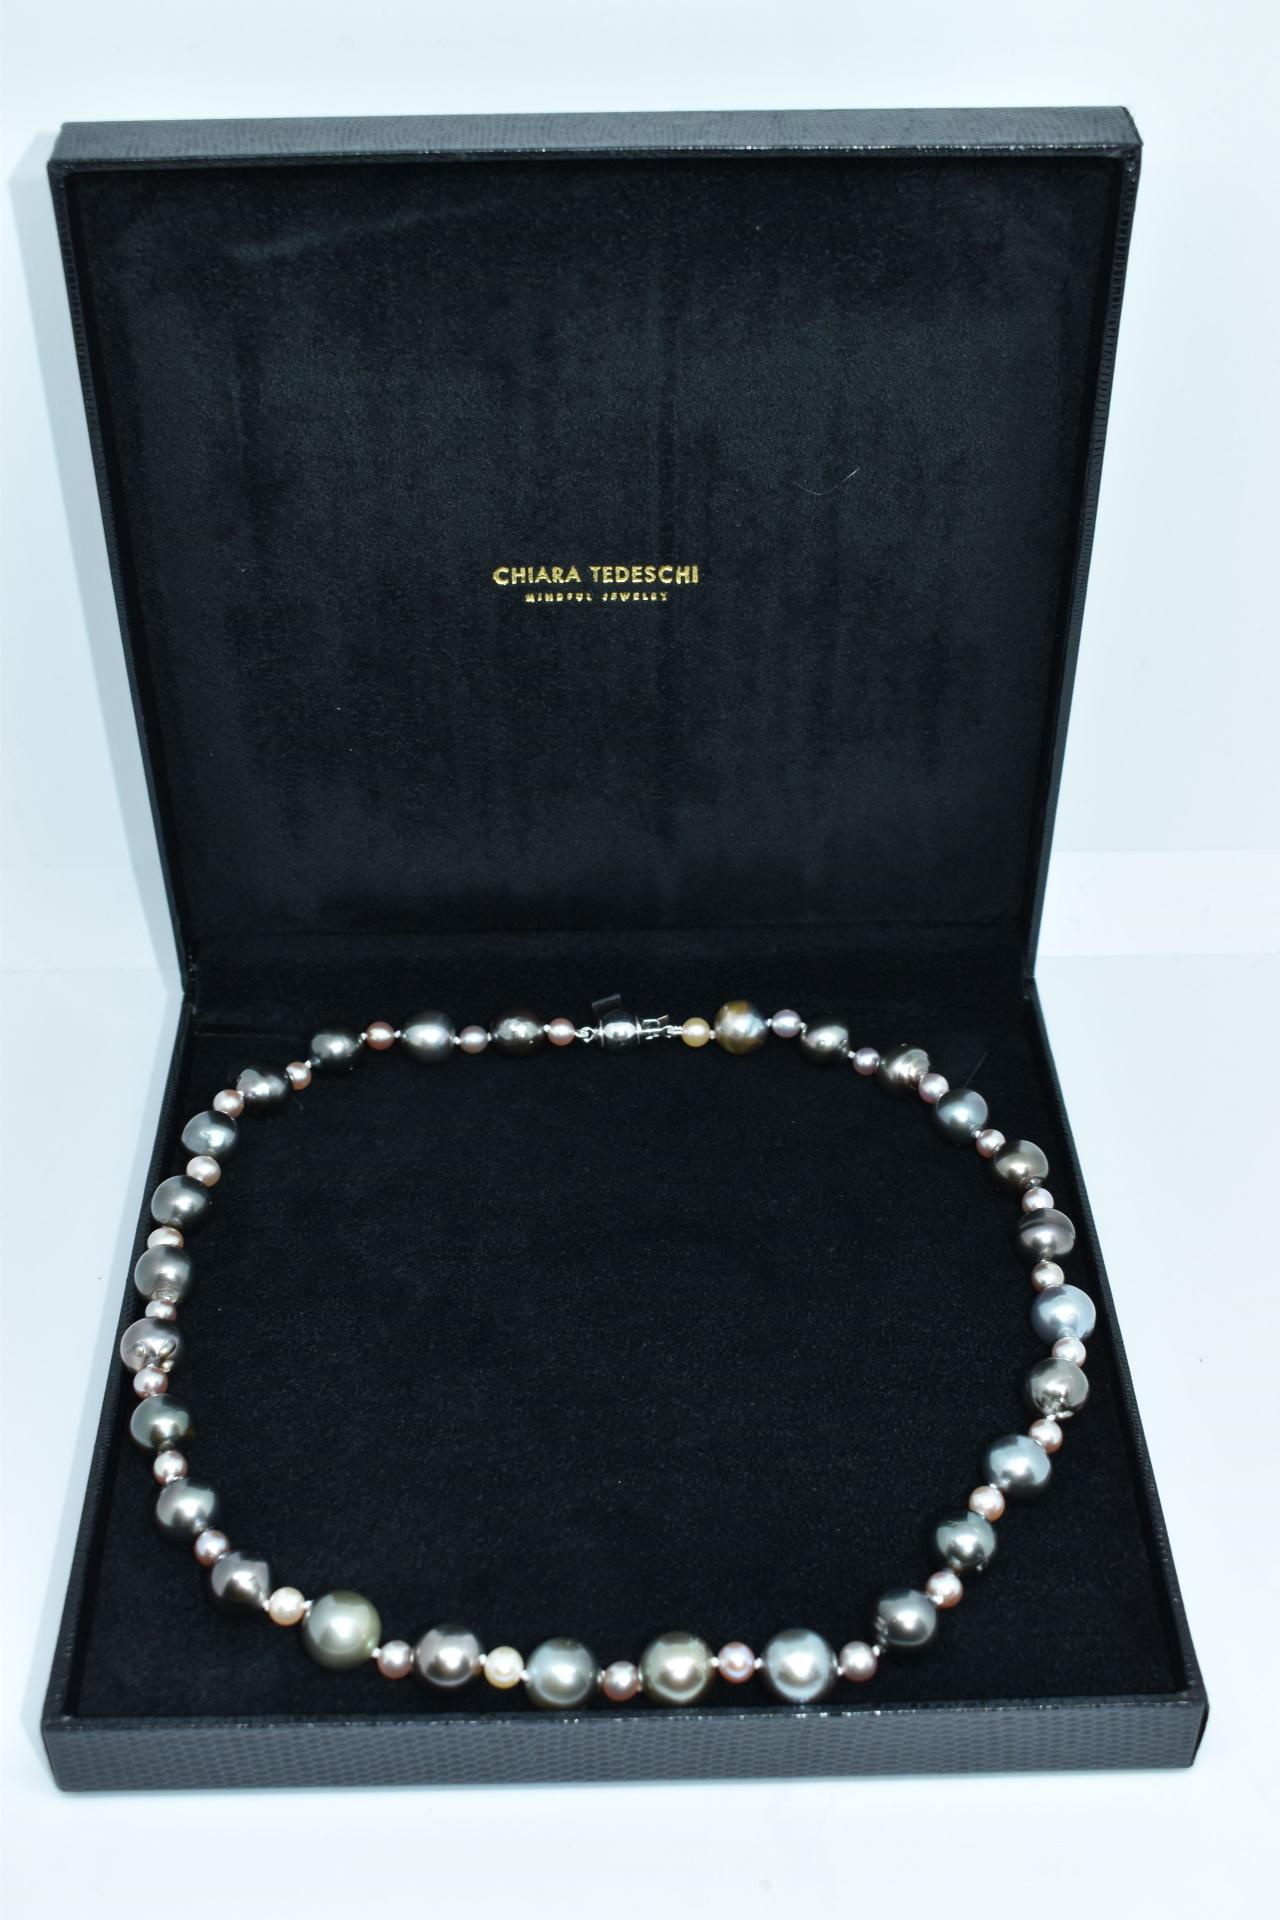 GEMSMU1303215 COLLANA DONNA 55 PERLE NATURALI MULTICOLORE 4 1stAmerican jewerly collana 55 perle naturali multicolore Ø12x135mm con chiusura in argento ag925